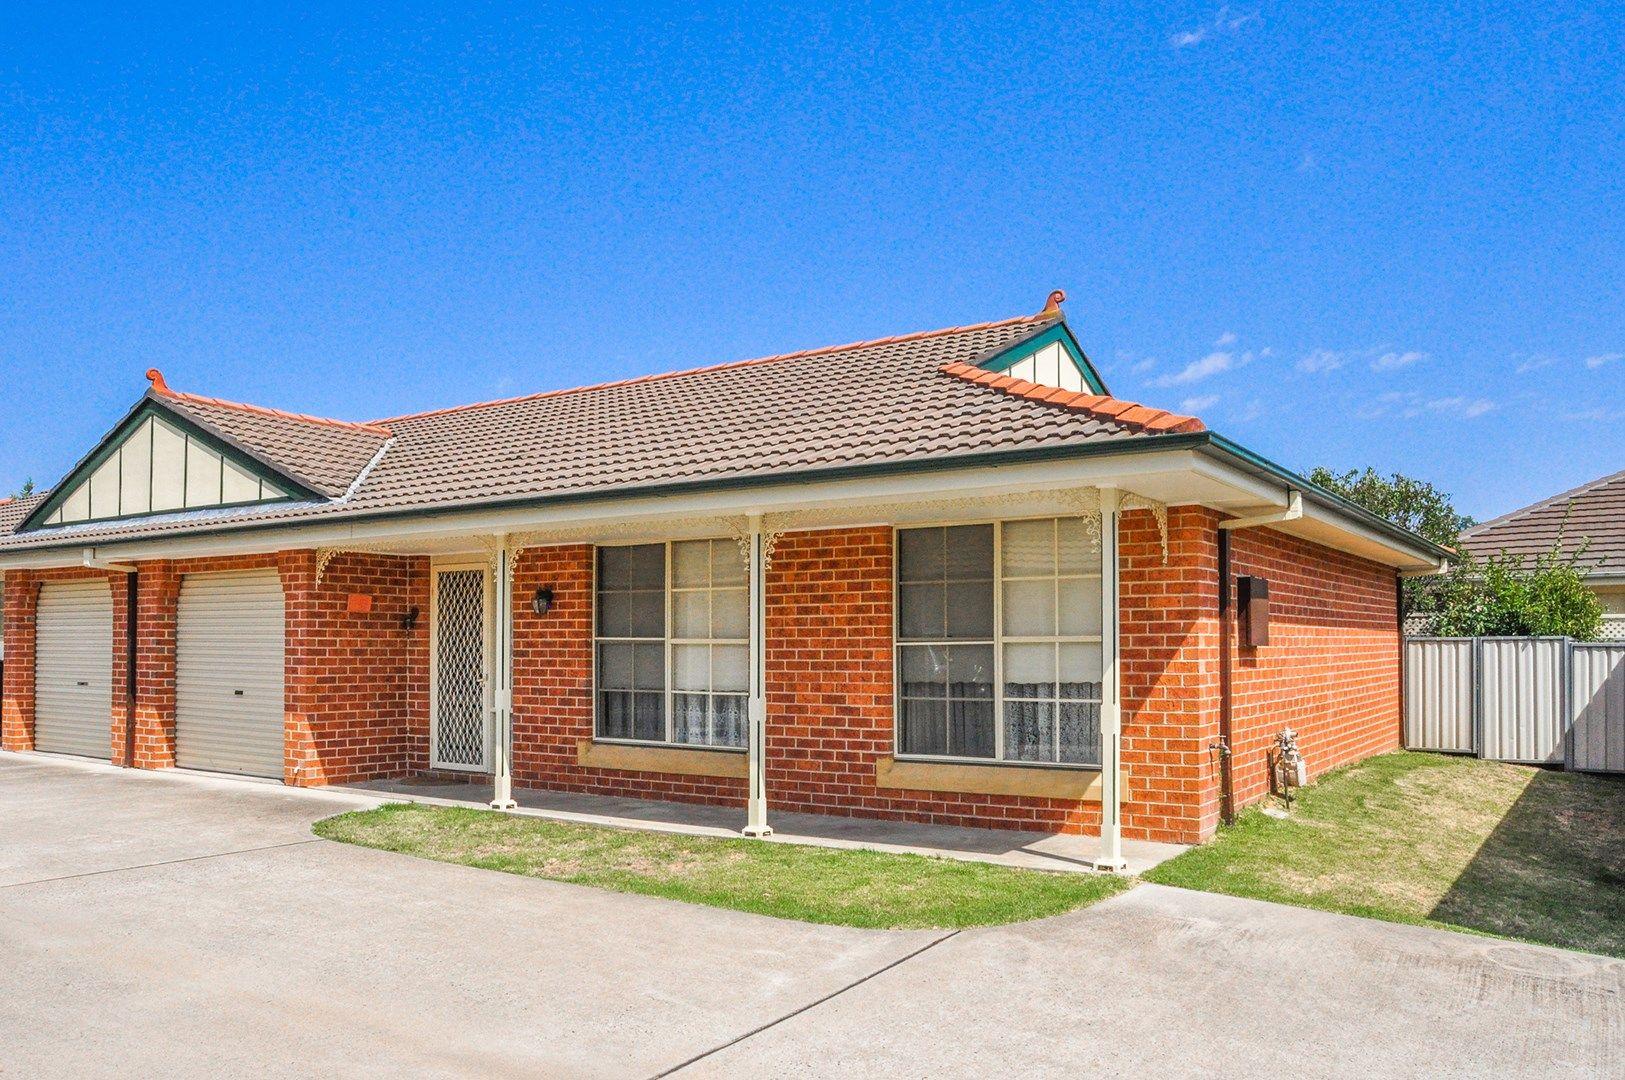 5/186 Lambert Street, Bathurst NSW 2795, Image 0